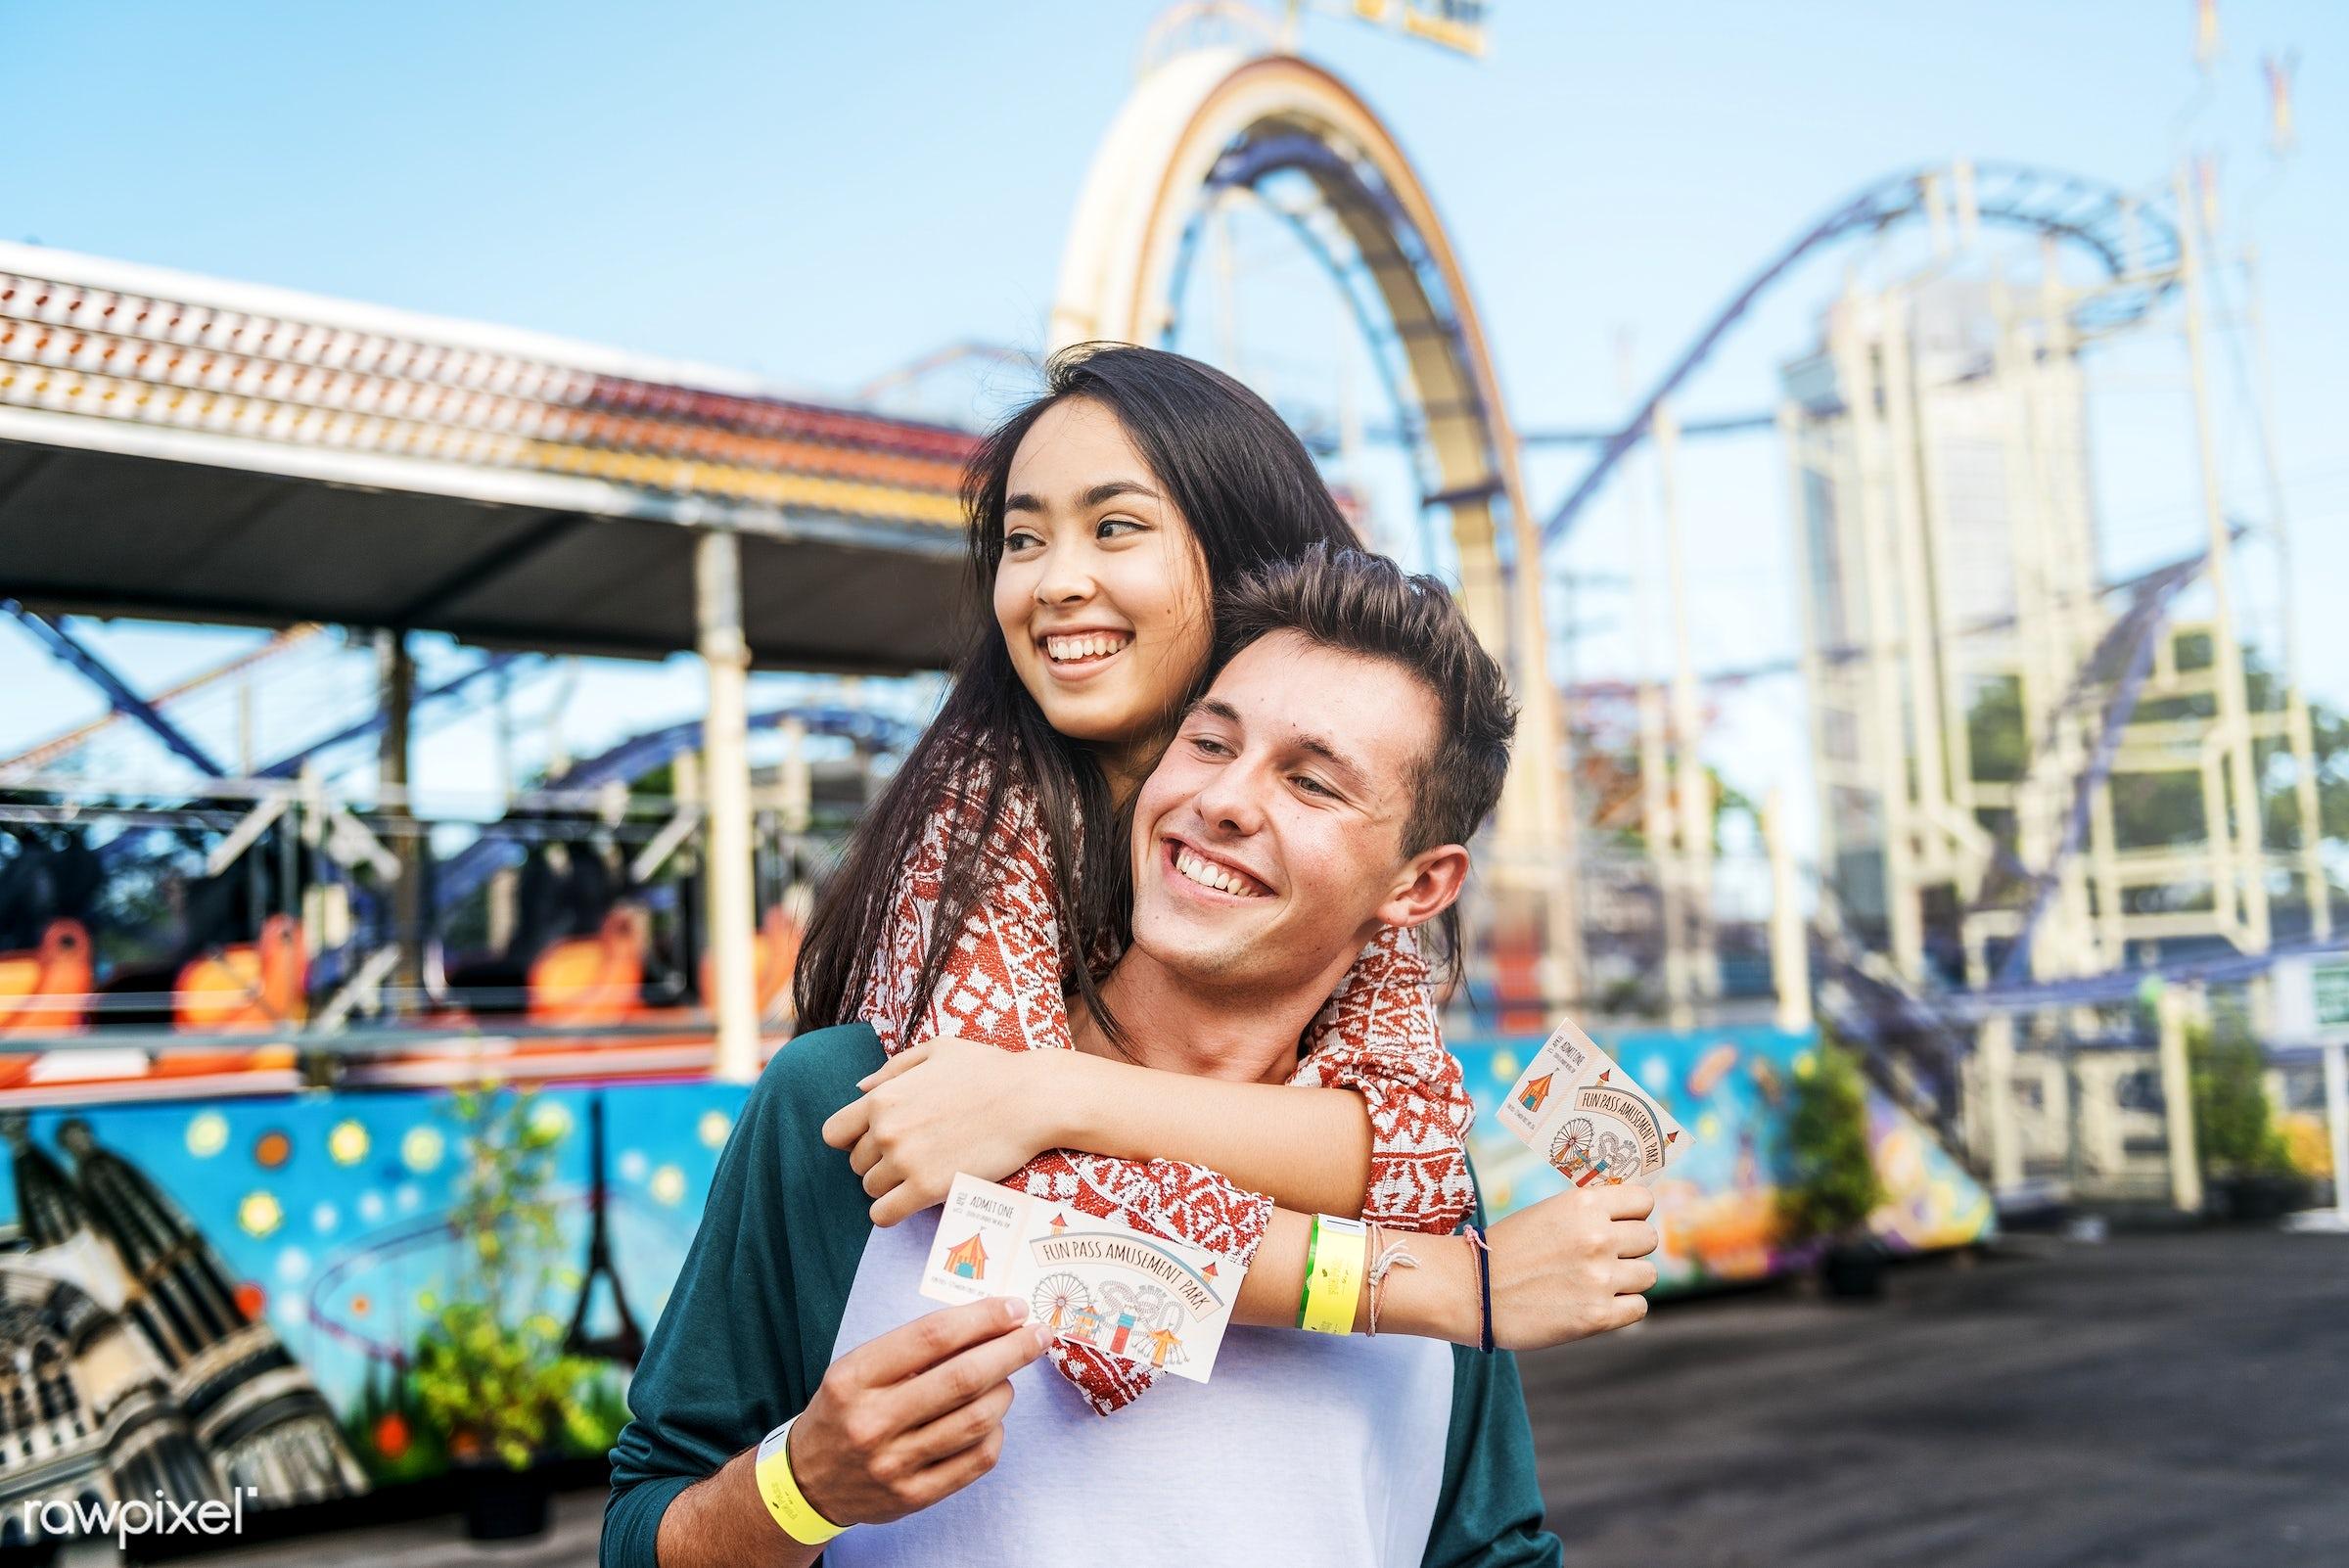 amusement park, adorable, affectionate, american, amusement, asian, beautiful, black hair, boyfriend, bright, candid, care,...